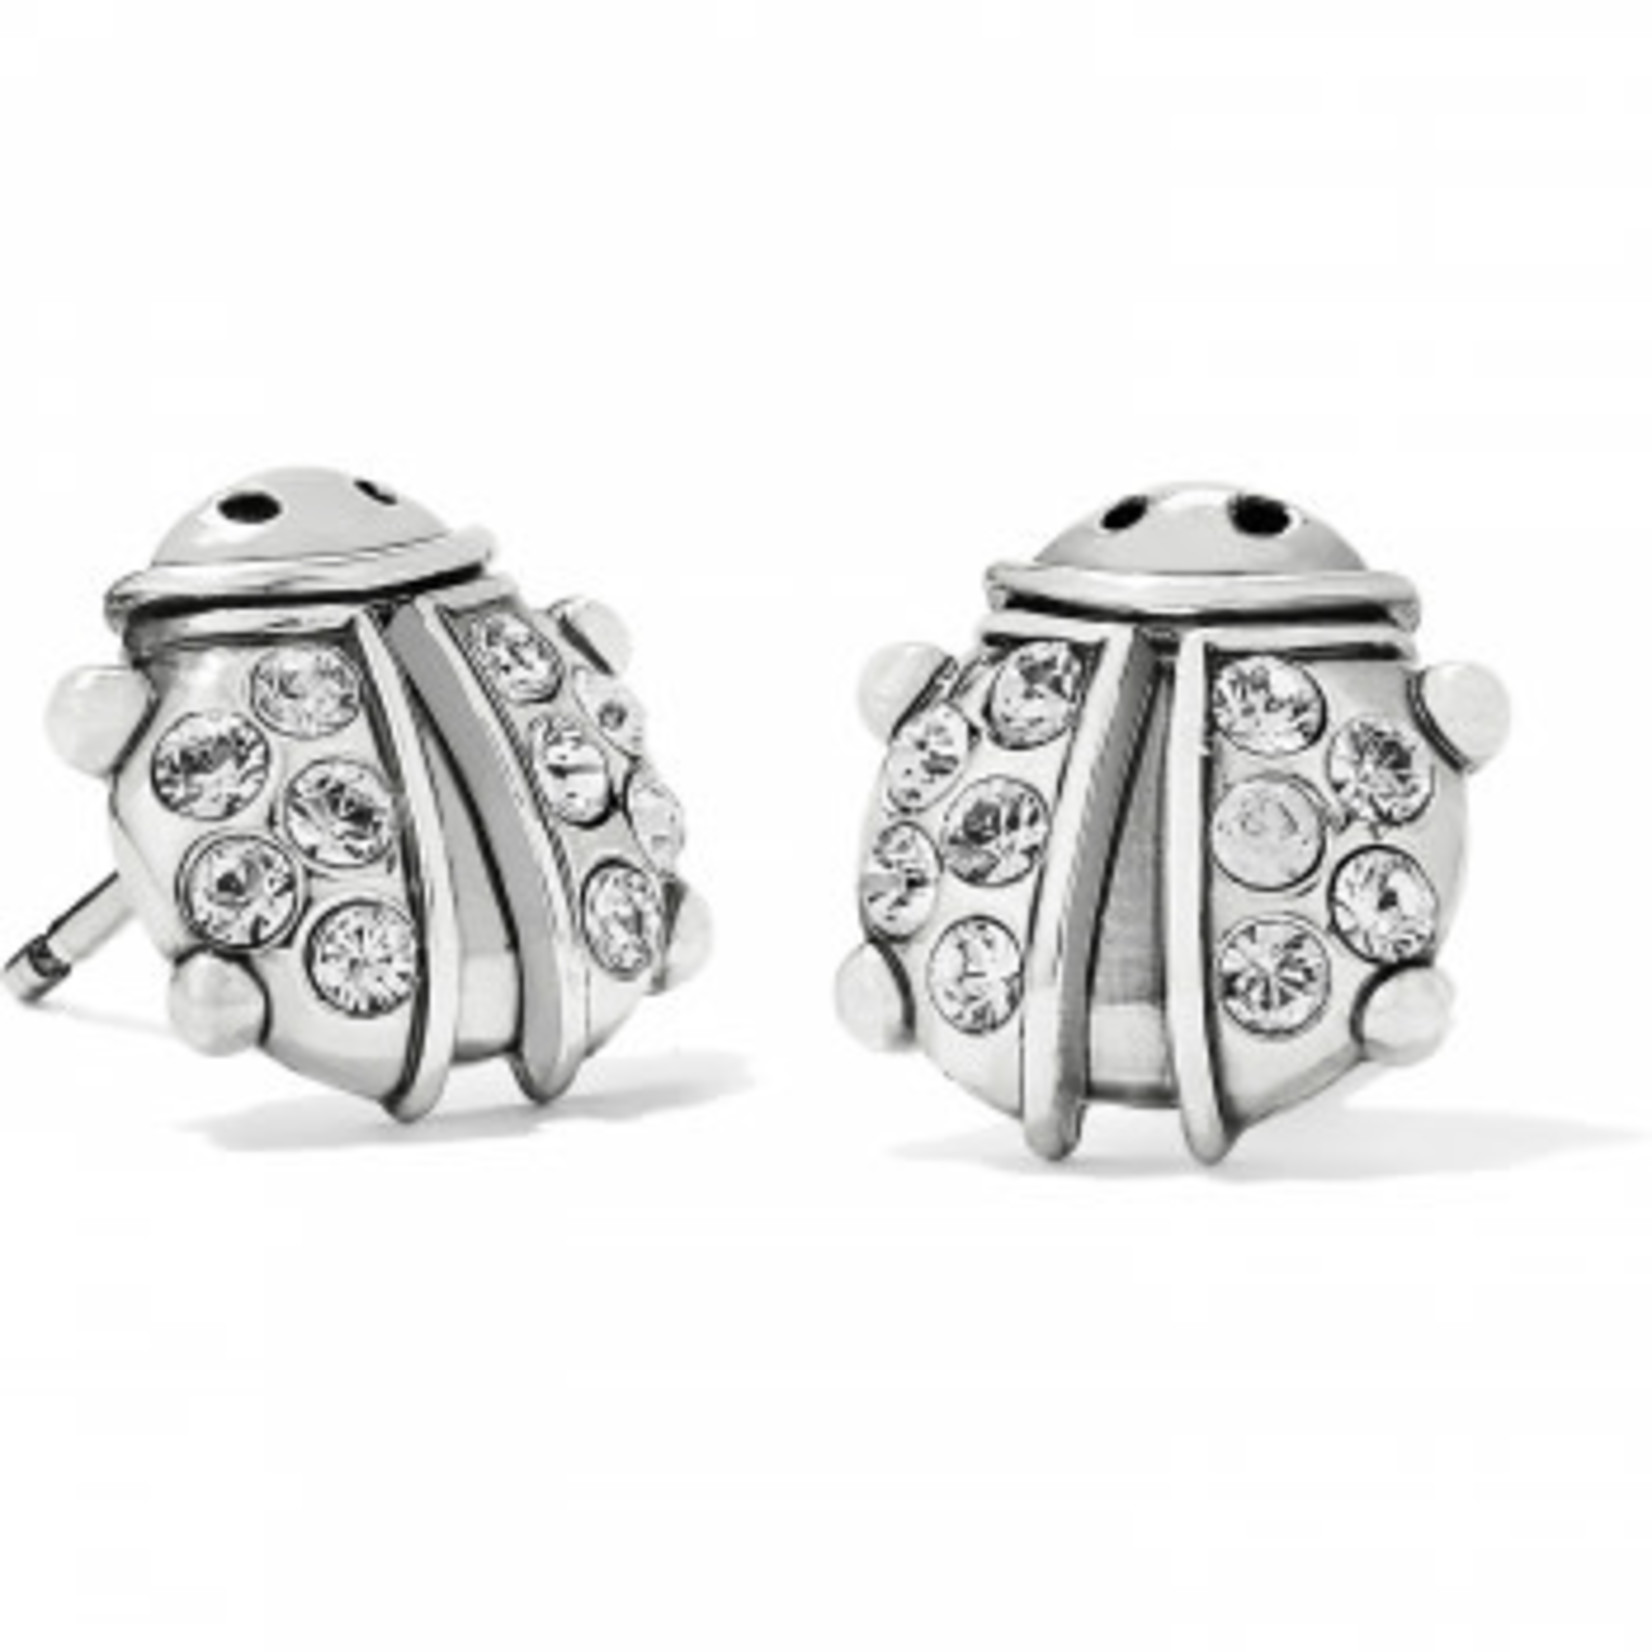 Brighton Lady Luck Mini Post Earrings Silver